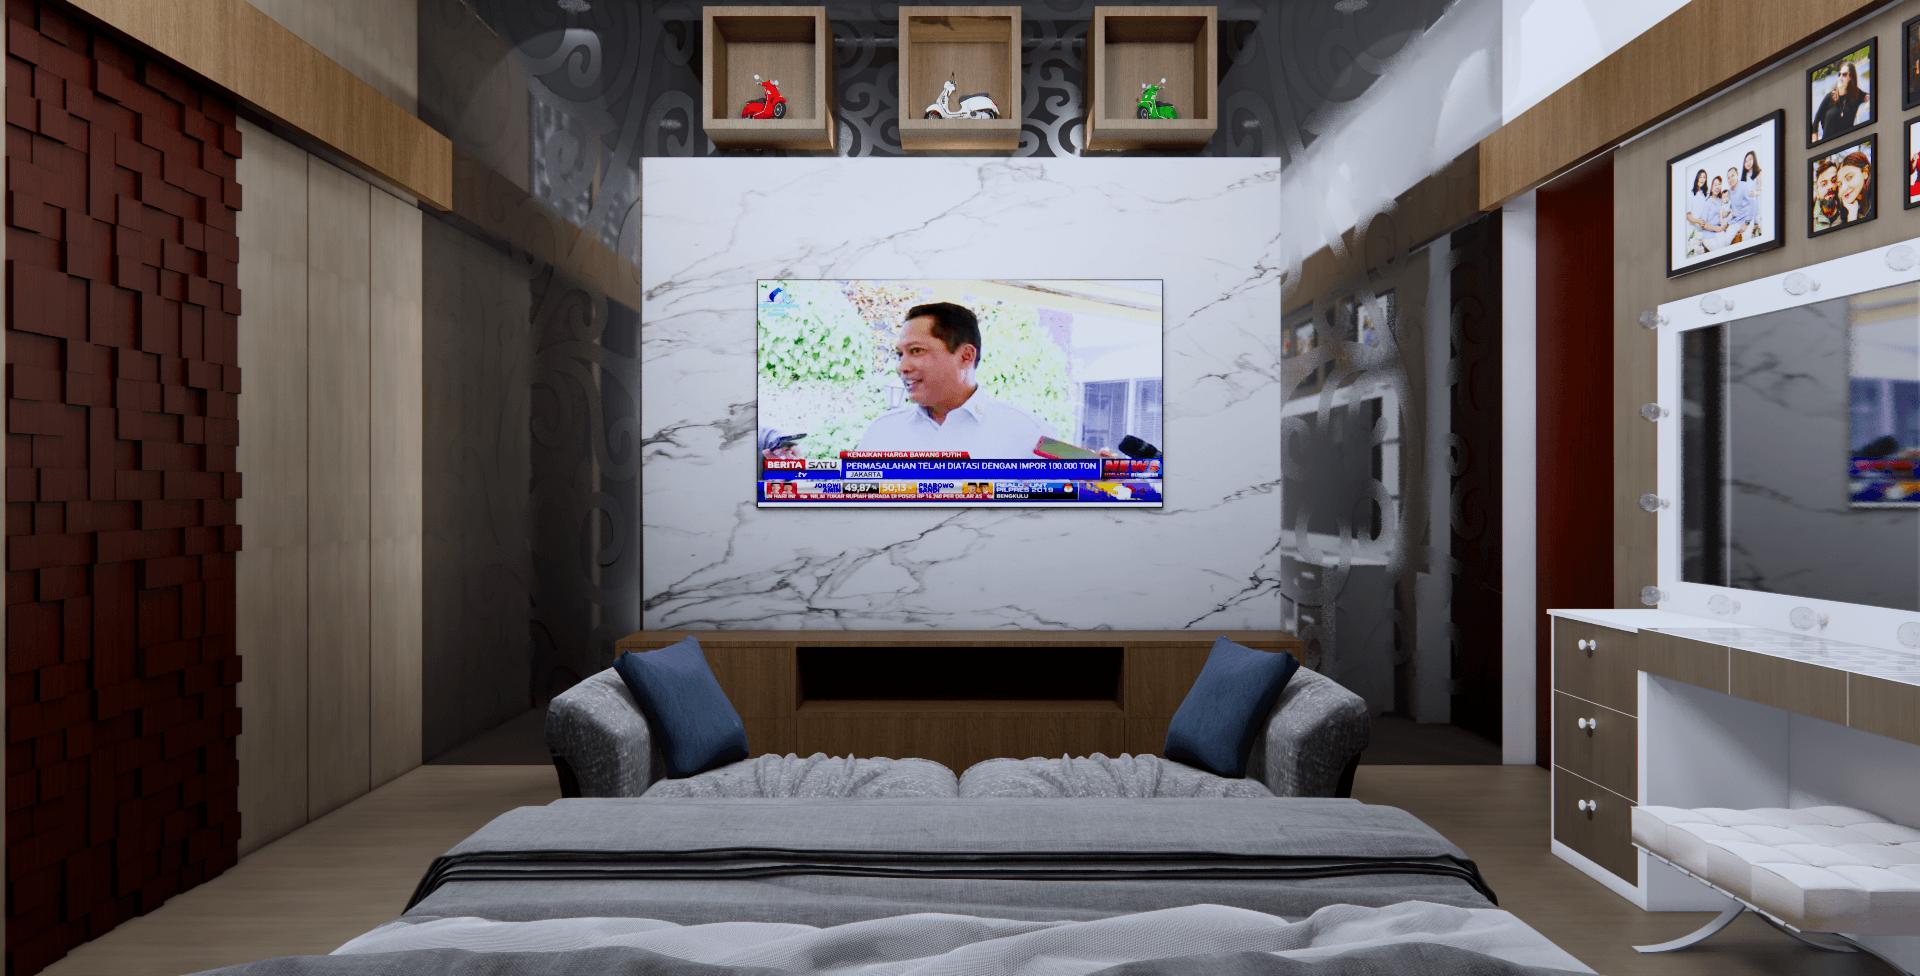 Ibnu Rusdi Rumah Tinggal Bapak Edo Surabaya, Kota Sby, Jawa Timur, Indonesia Surabaya, Kota Sby, Jawa Timur, Indonesia Ibnu-Rusdi-Rumah-Tinggal-Bapak-Edo  108460